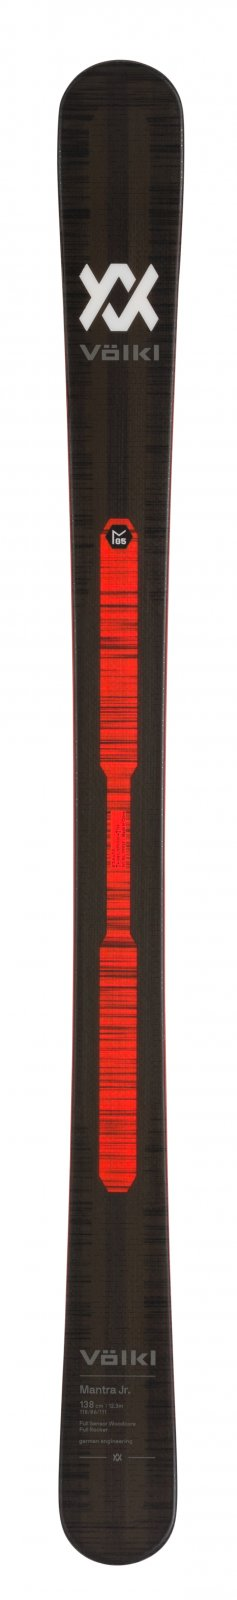 Volkl Mantra JR Skis 2020 - size 138cm